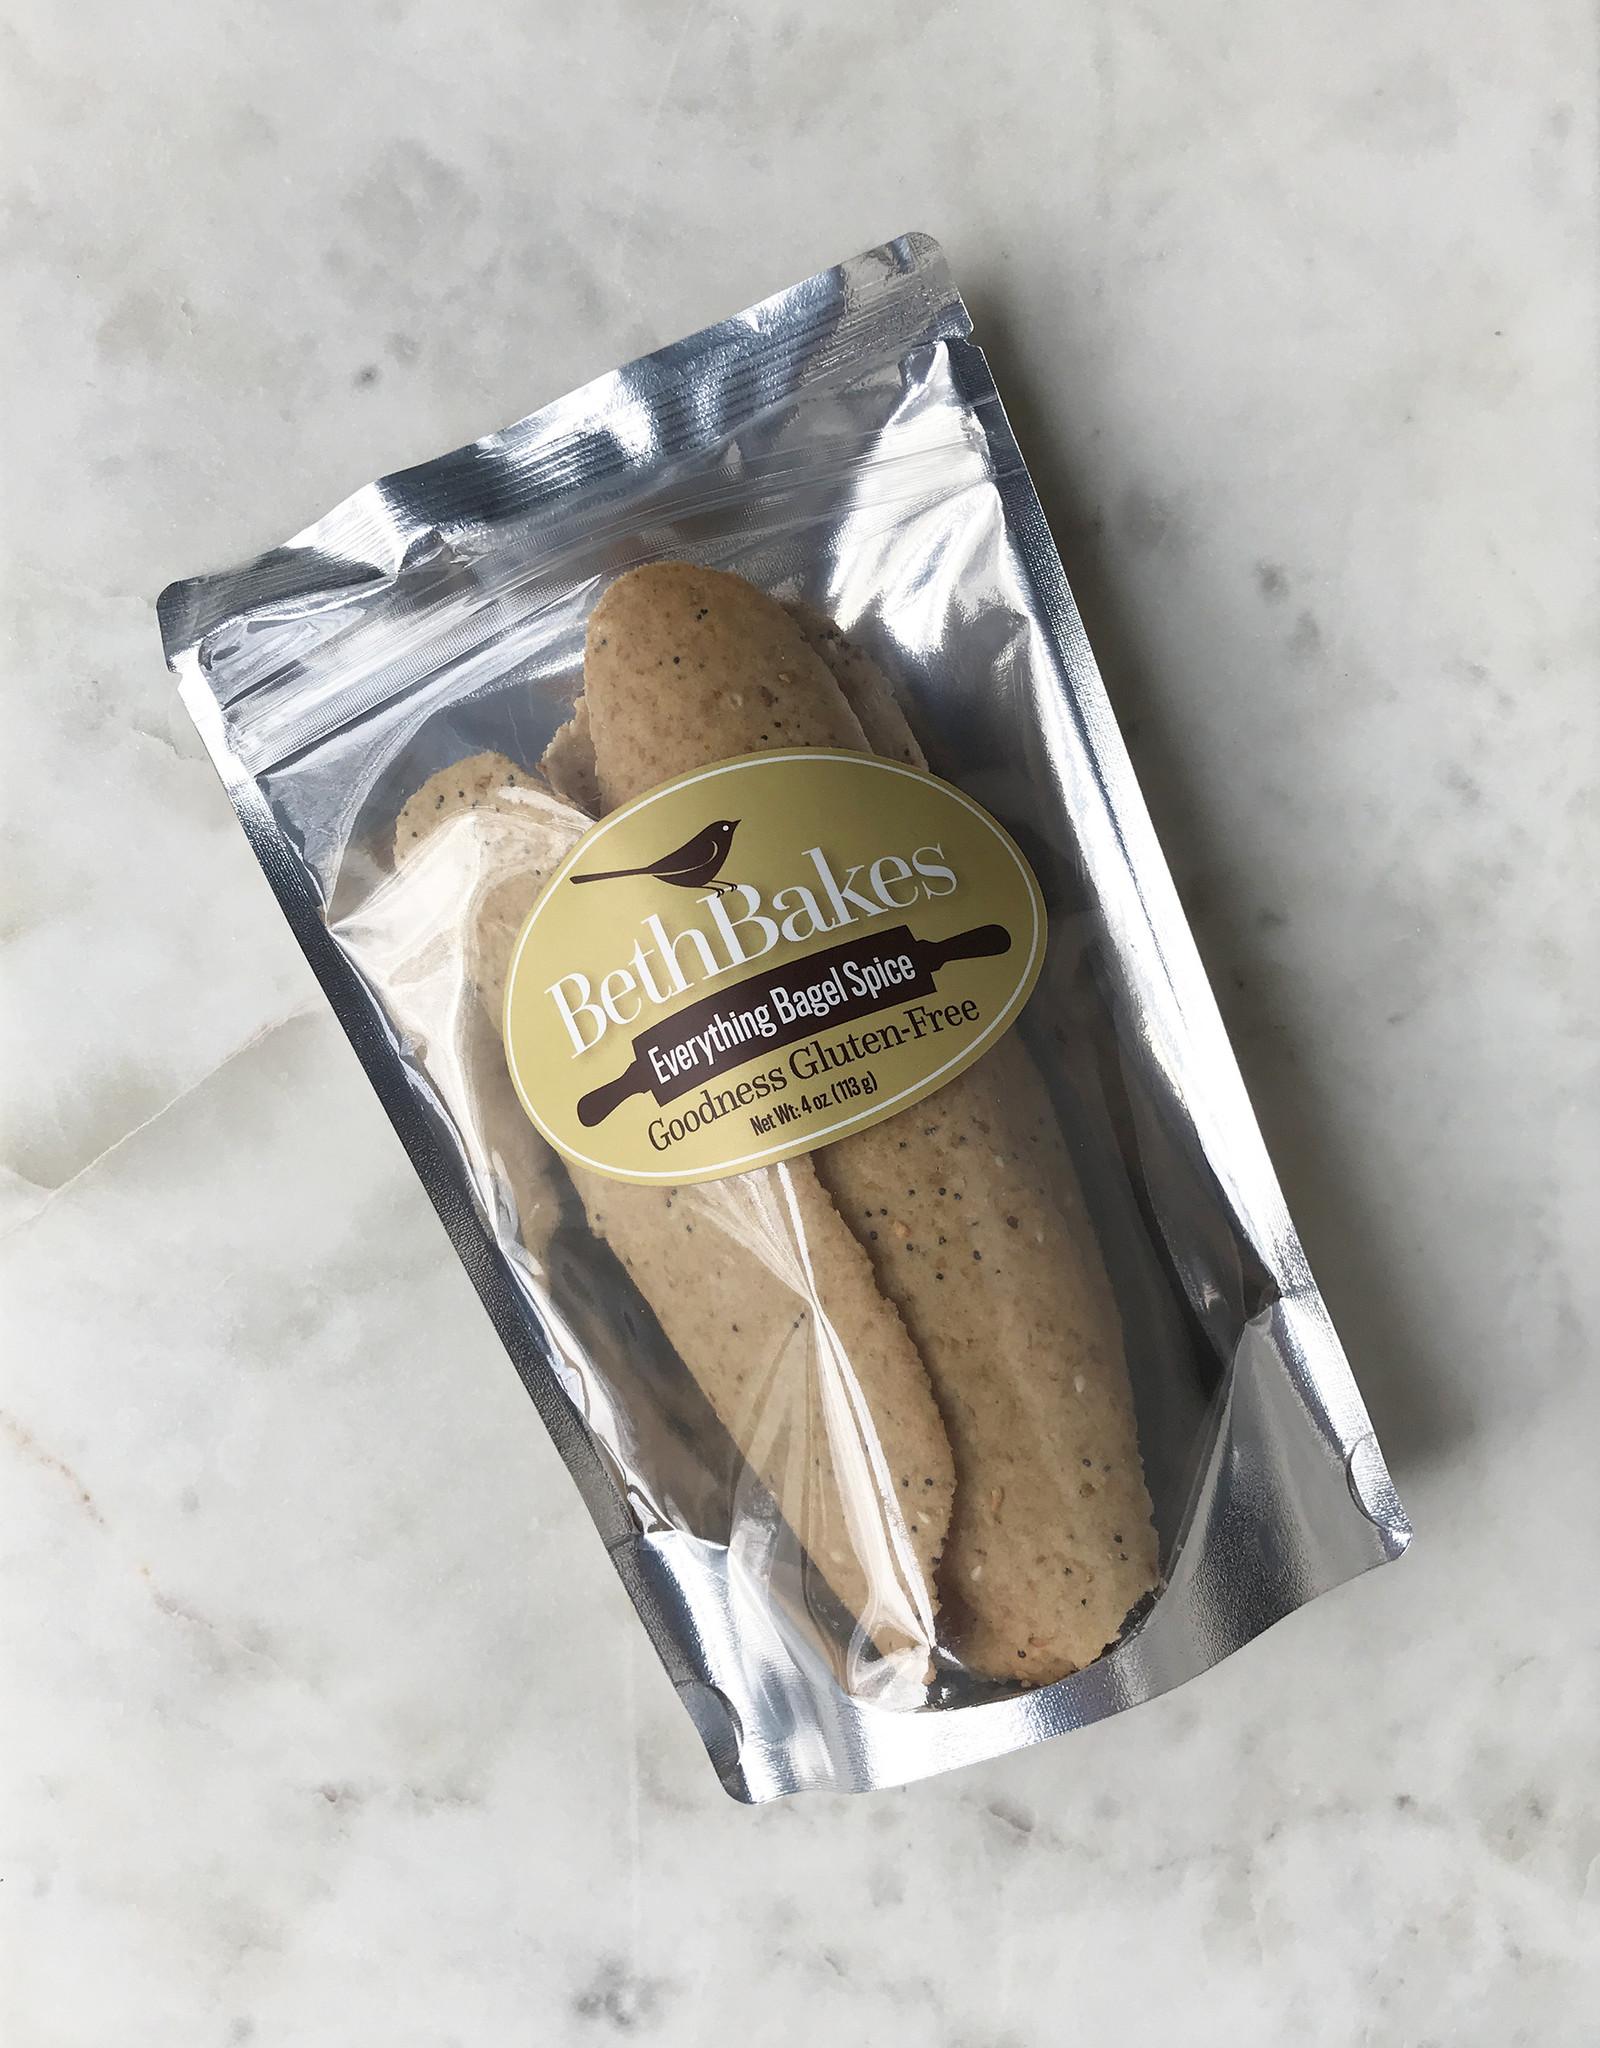 Beth Bakes Beth Bakes Gluten Free Crackers